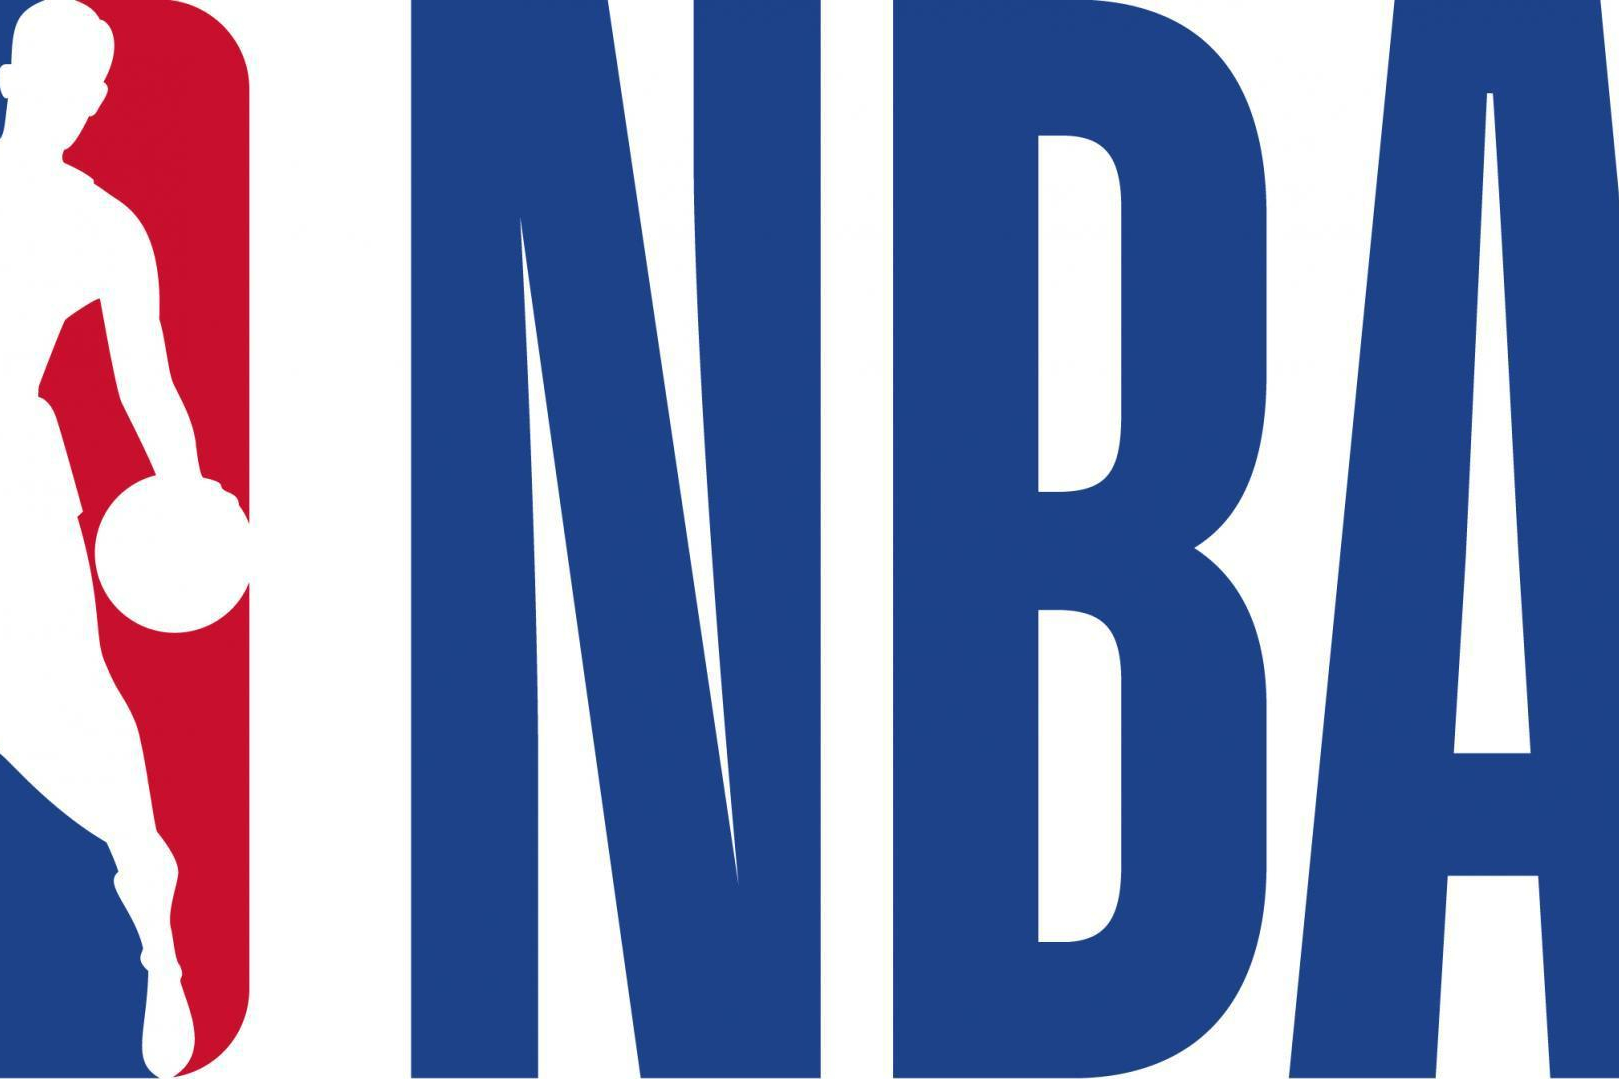 NBA_Logoman_2017-horizontal